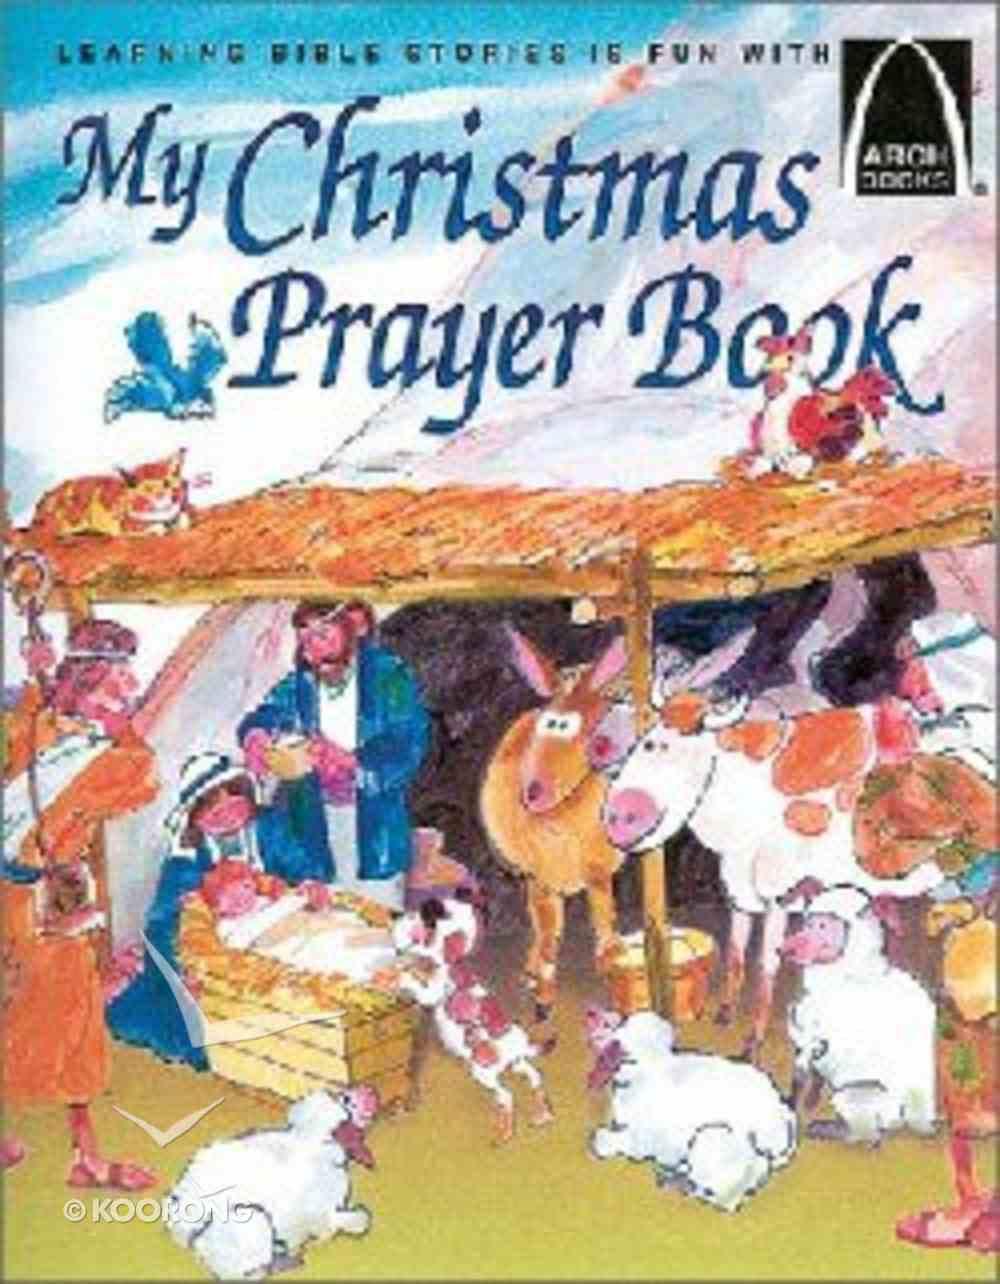 My Christmas Prayer Book (Arch Books Series) Paperback